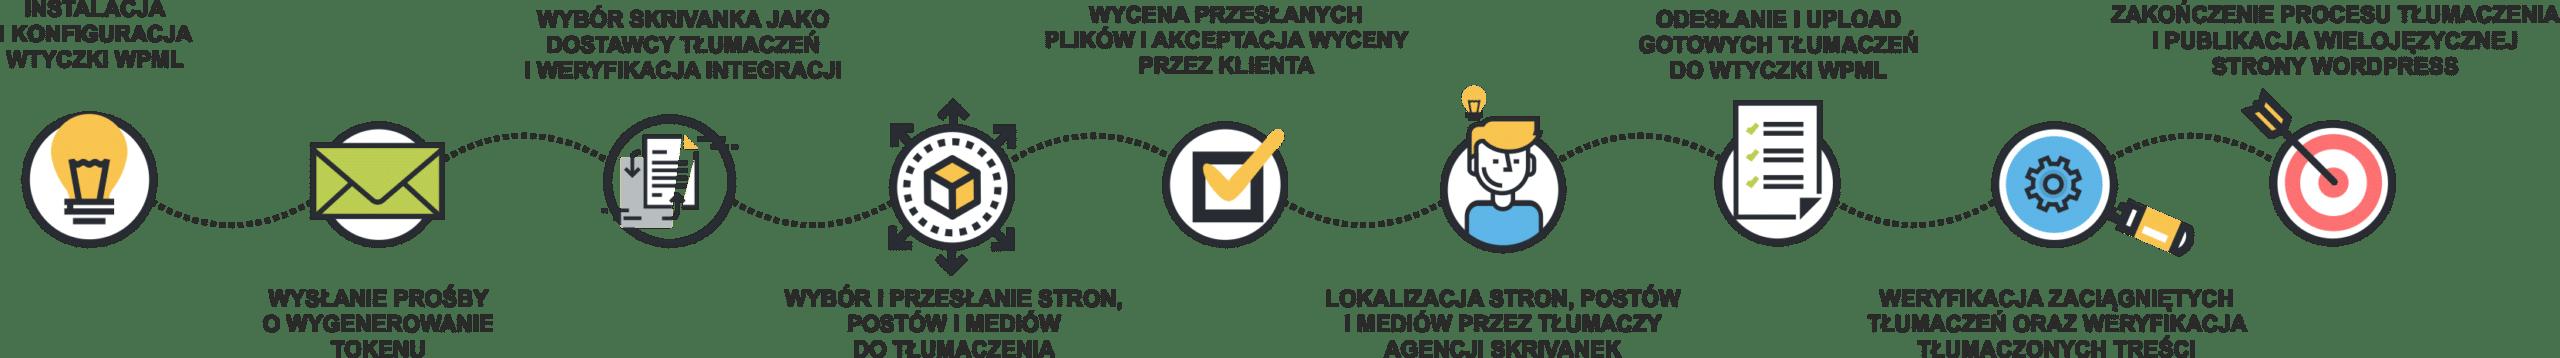 WPML PROCESS